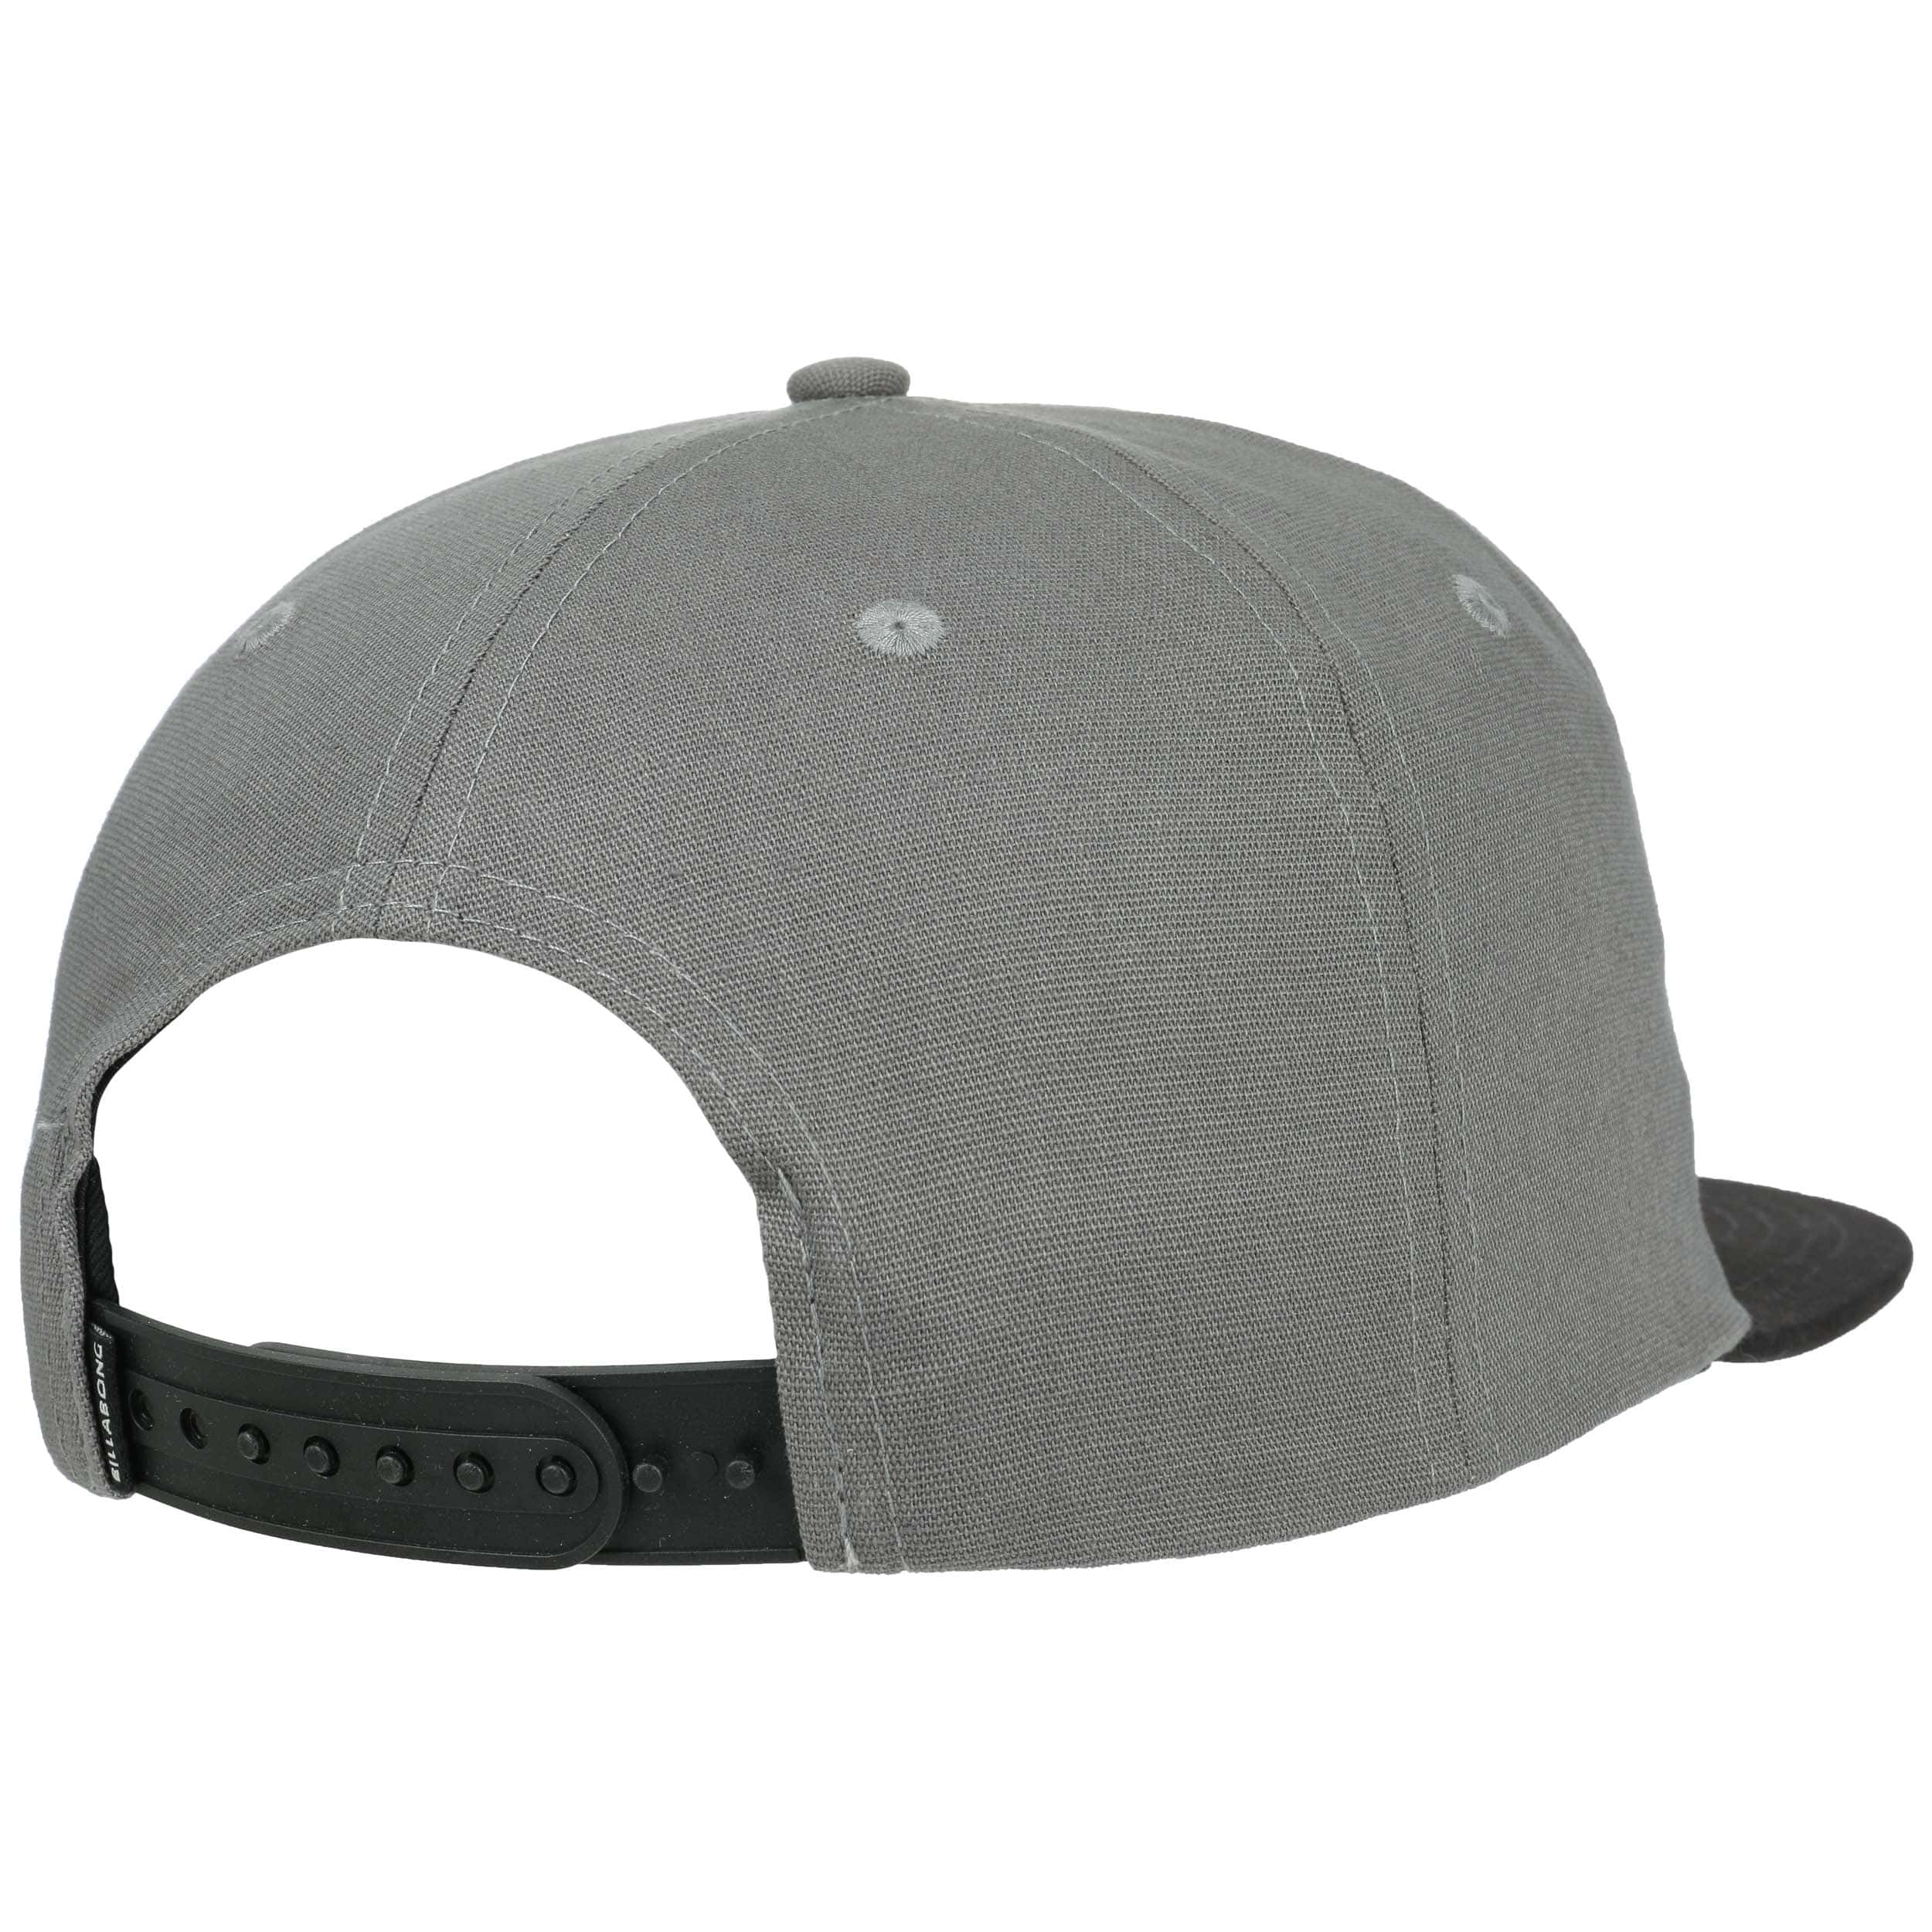 Gorra All Day Snapback by Billabong - Gorras - sombreroshop.es 0fc8a0e0750